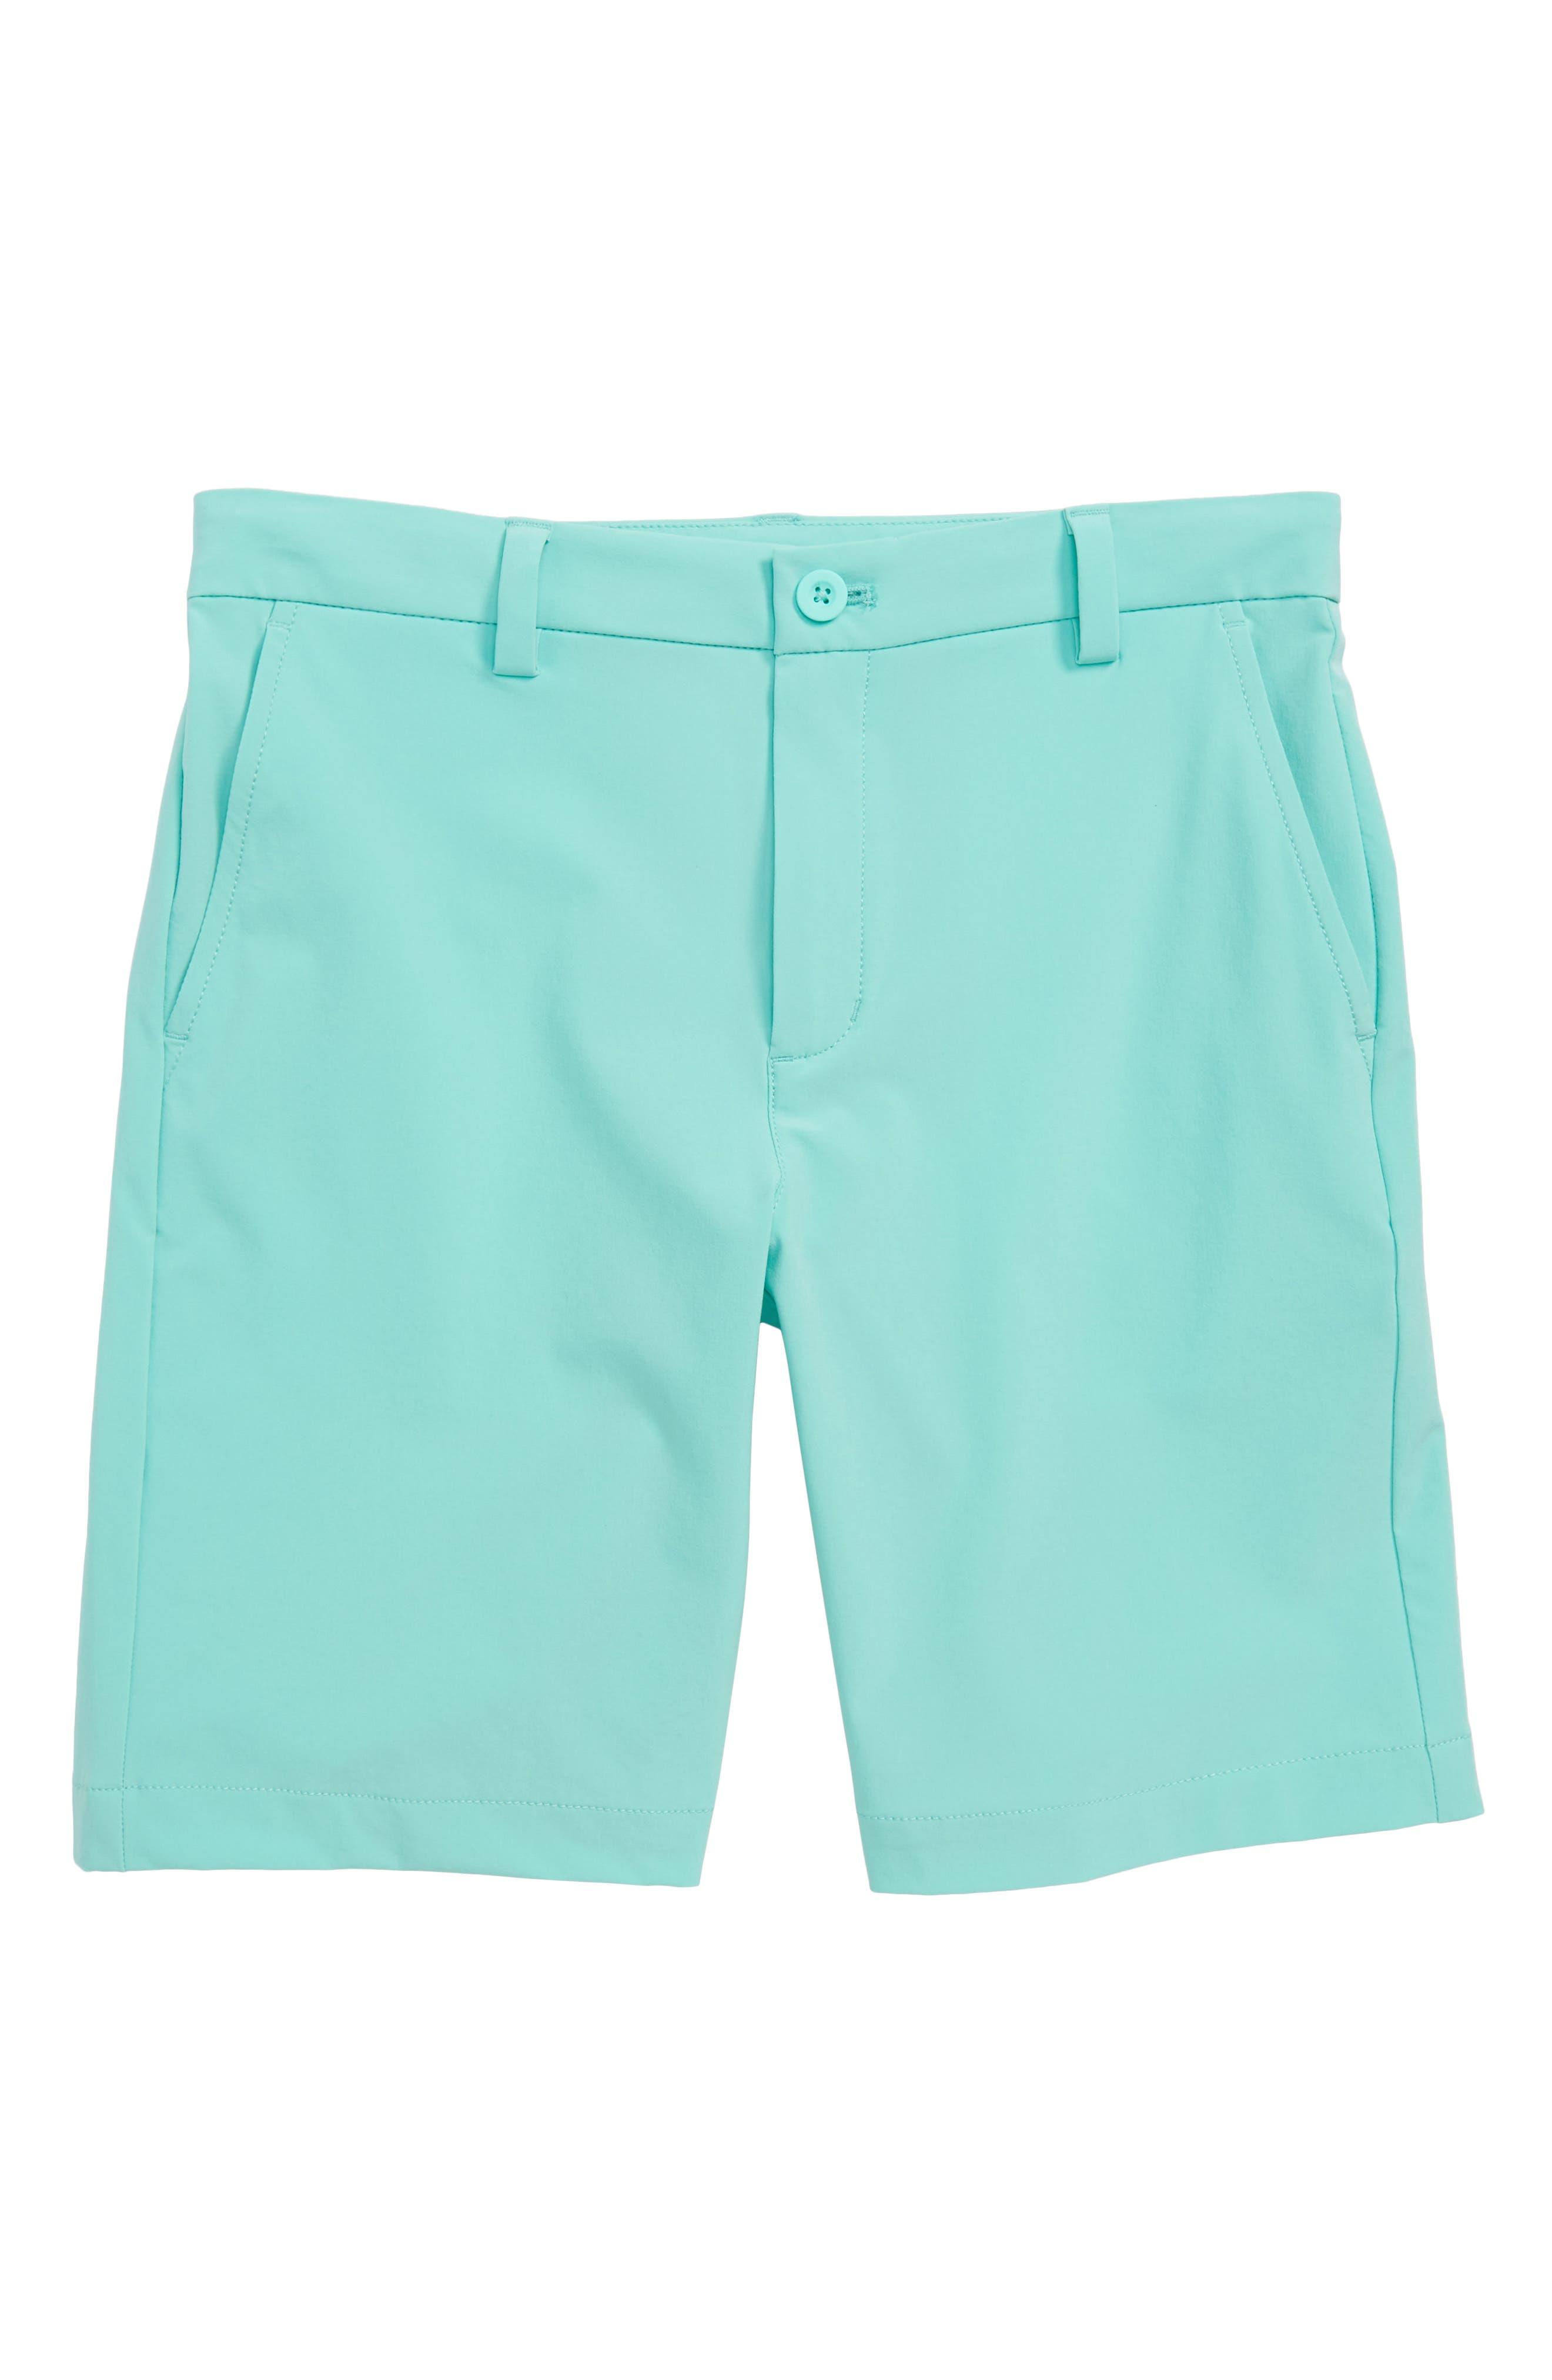 Performance Breaker Shorts,                         Main,                         color, CAPRI BLUE